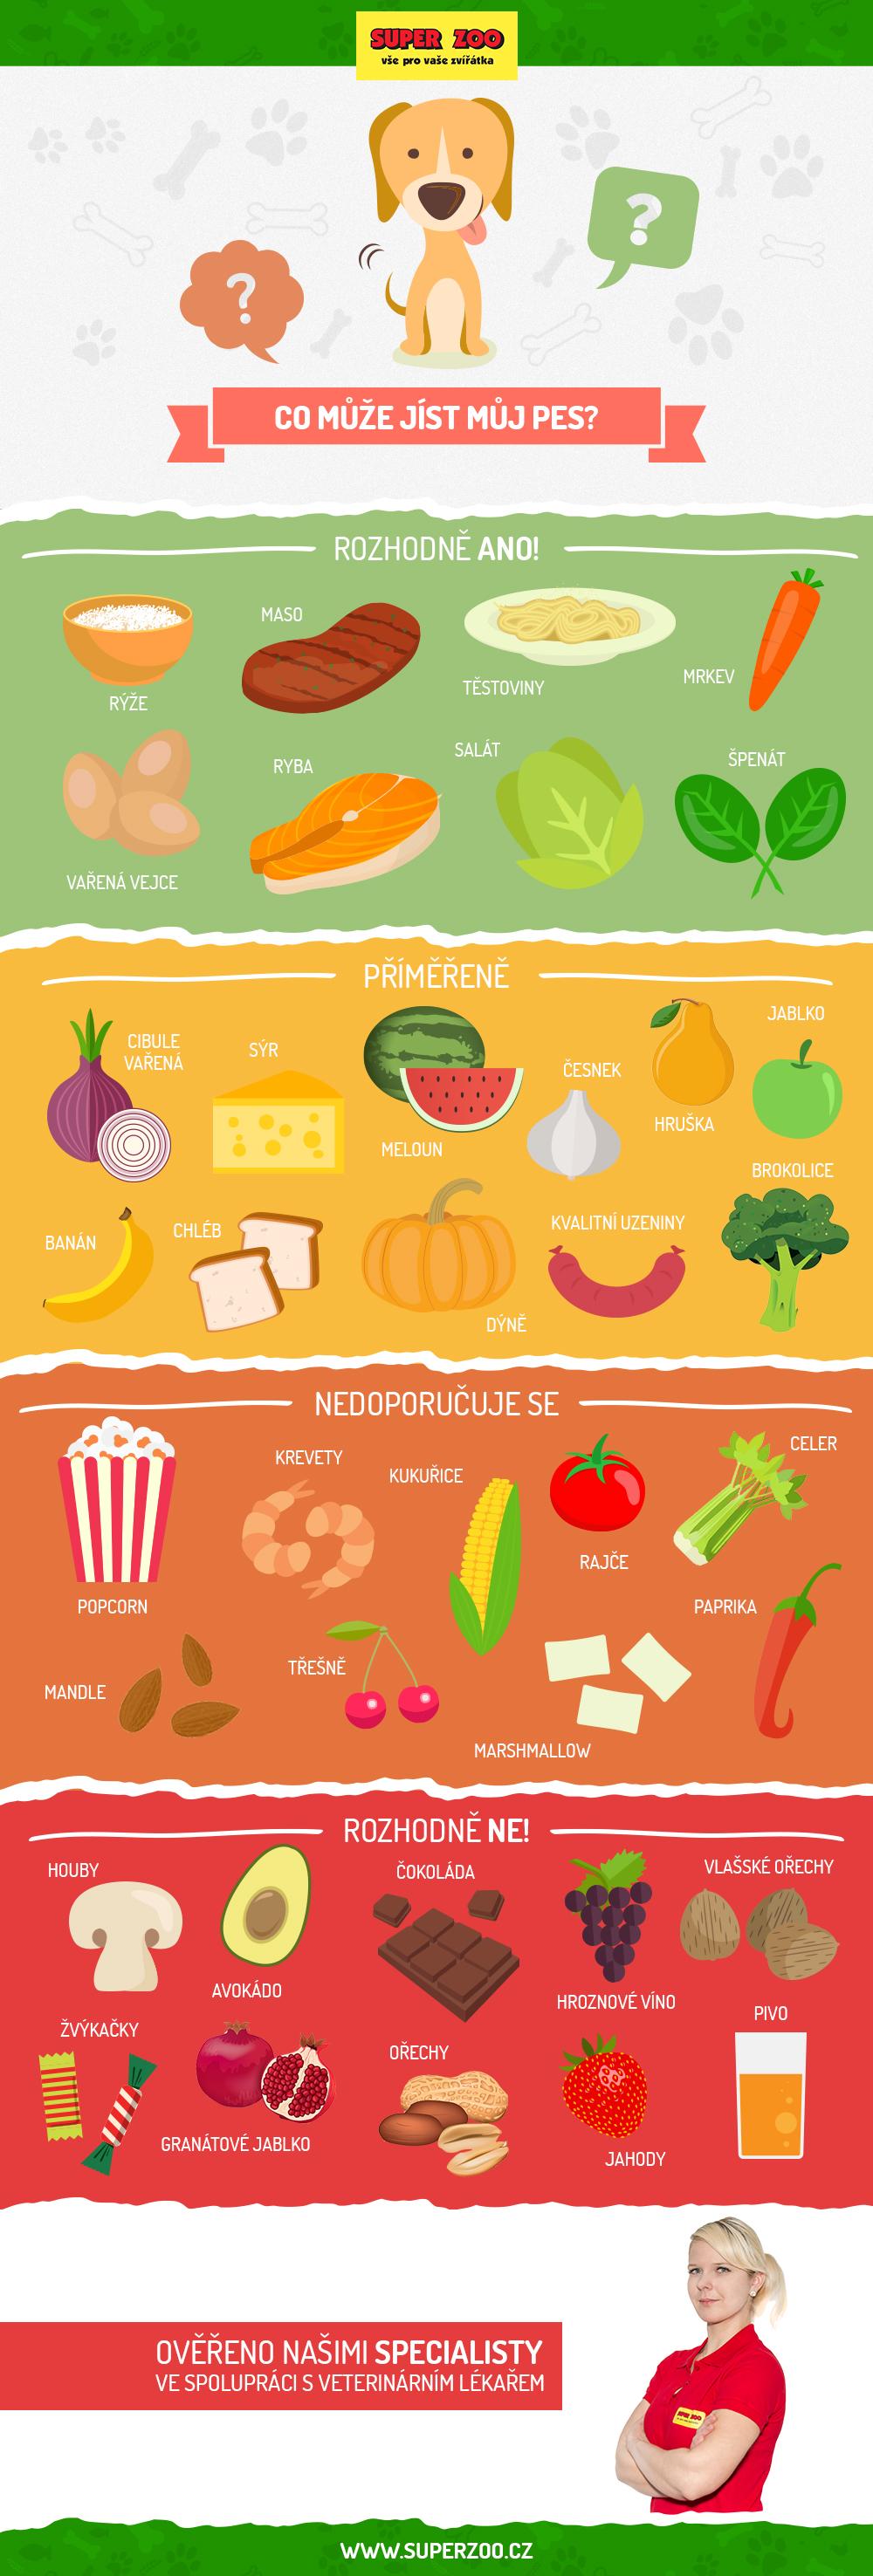 Infografika Superzoo.cz.